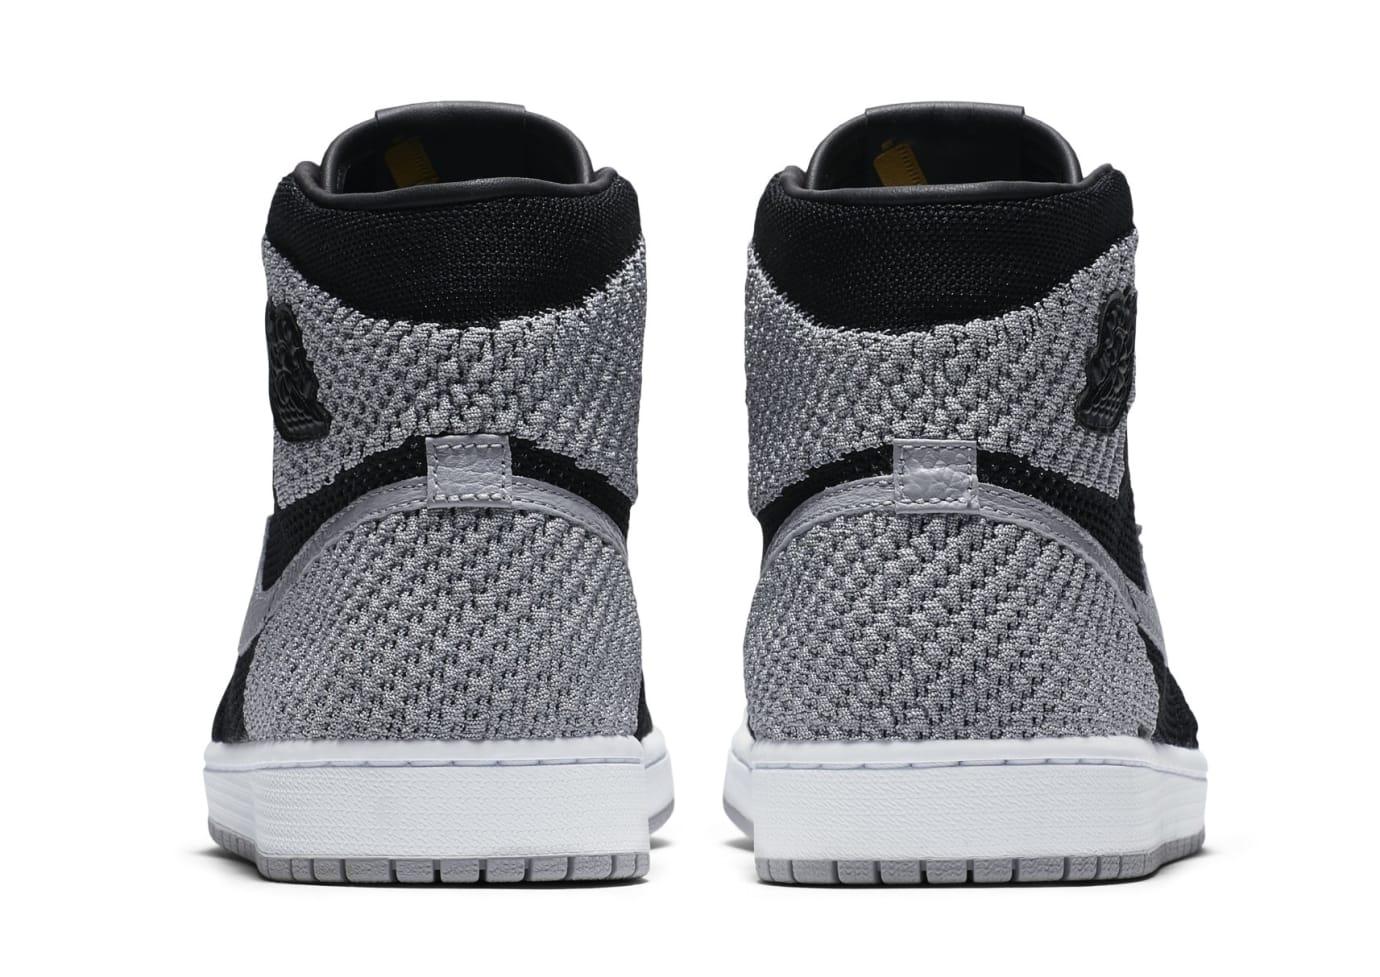 ab38b00654ff Image via Nike Air Jordan 1 Flyknit  Shadow  Black Medium Grey-White 919704- 003